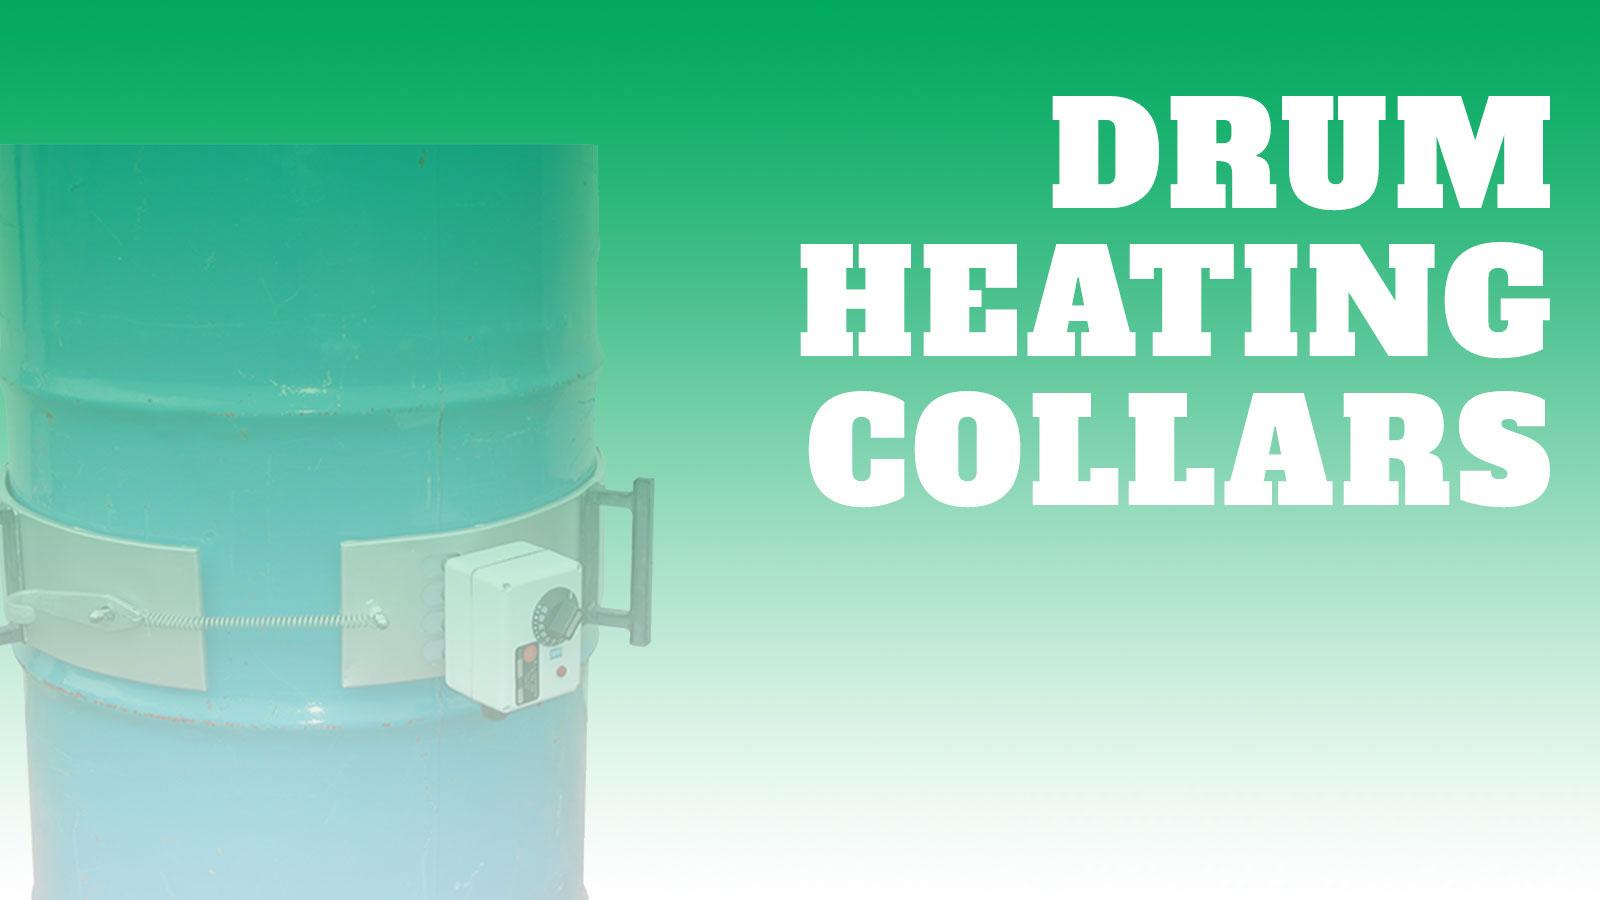 DrumHandling-Heating-Collars